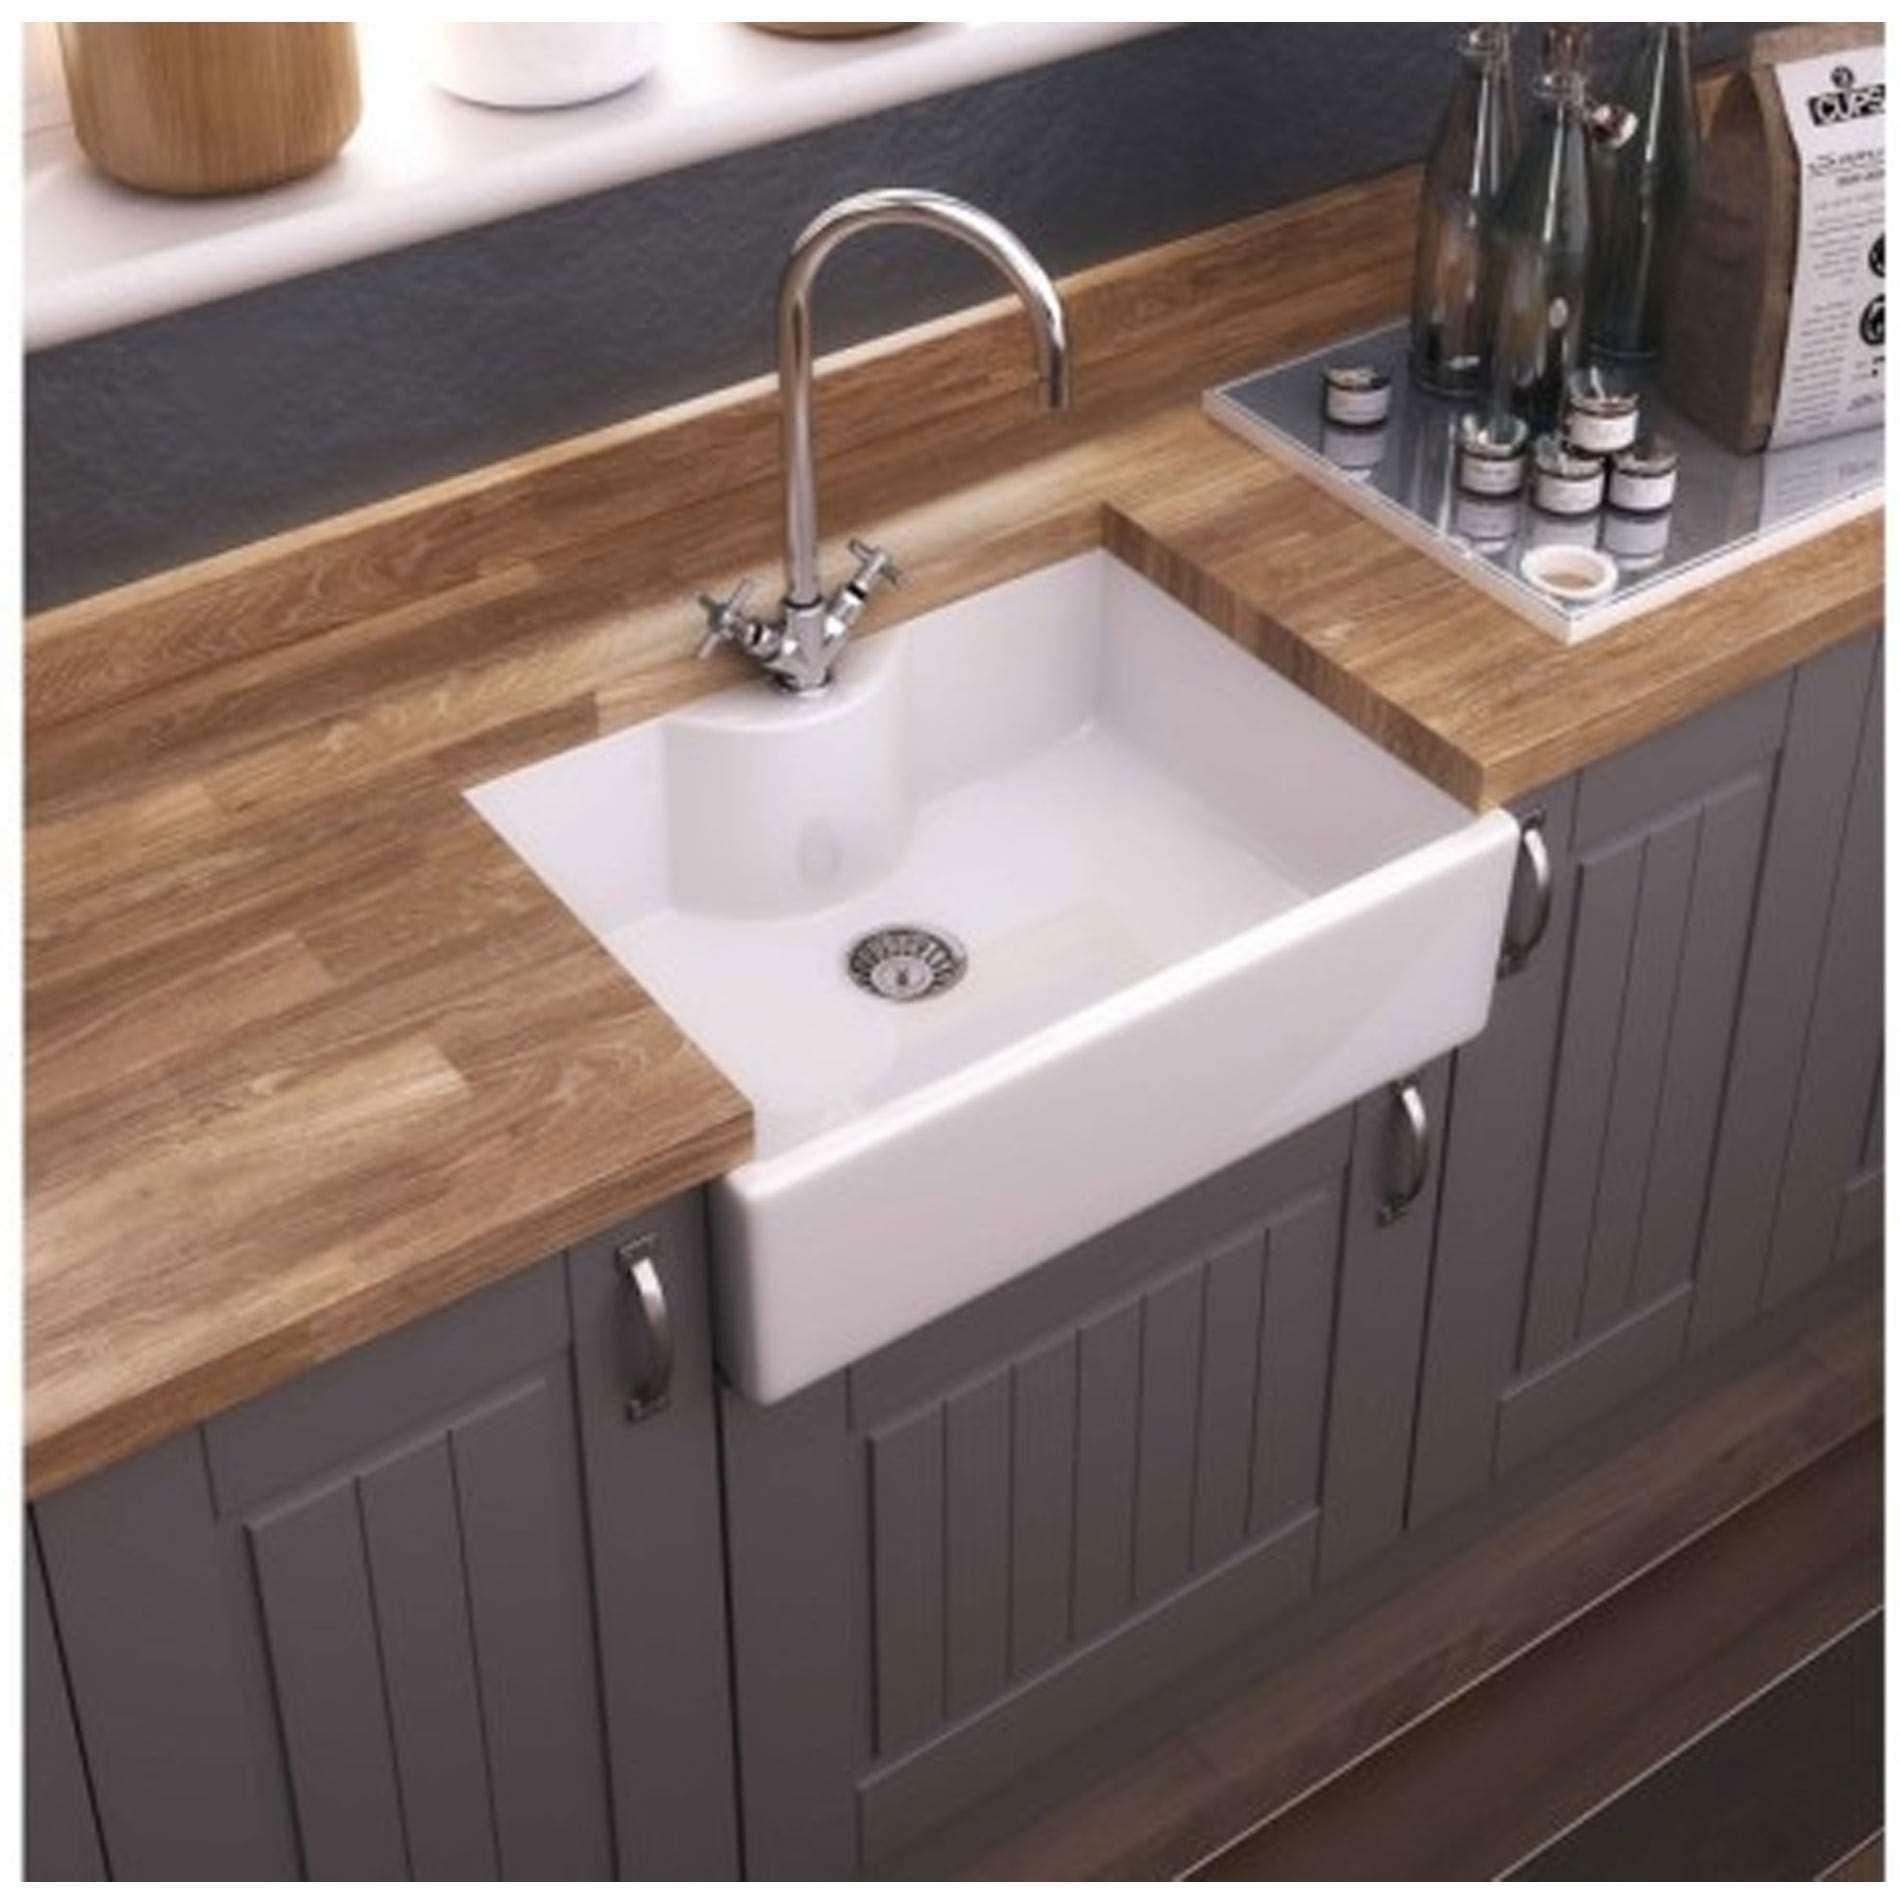 Thomas Denby Legacy 600t Ceramic Sink Kitchen Sinks Taps